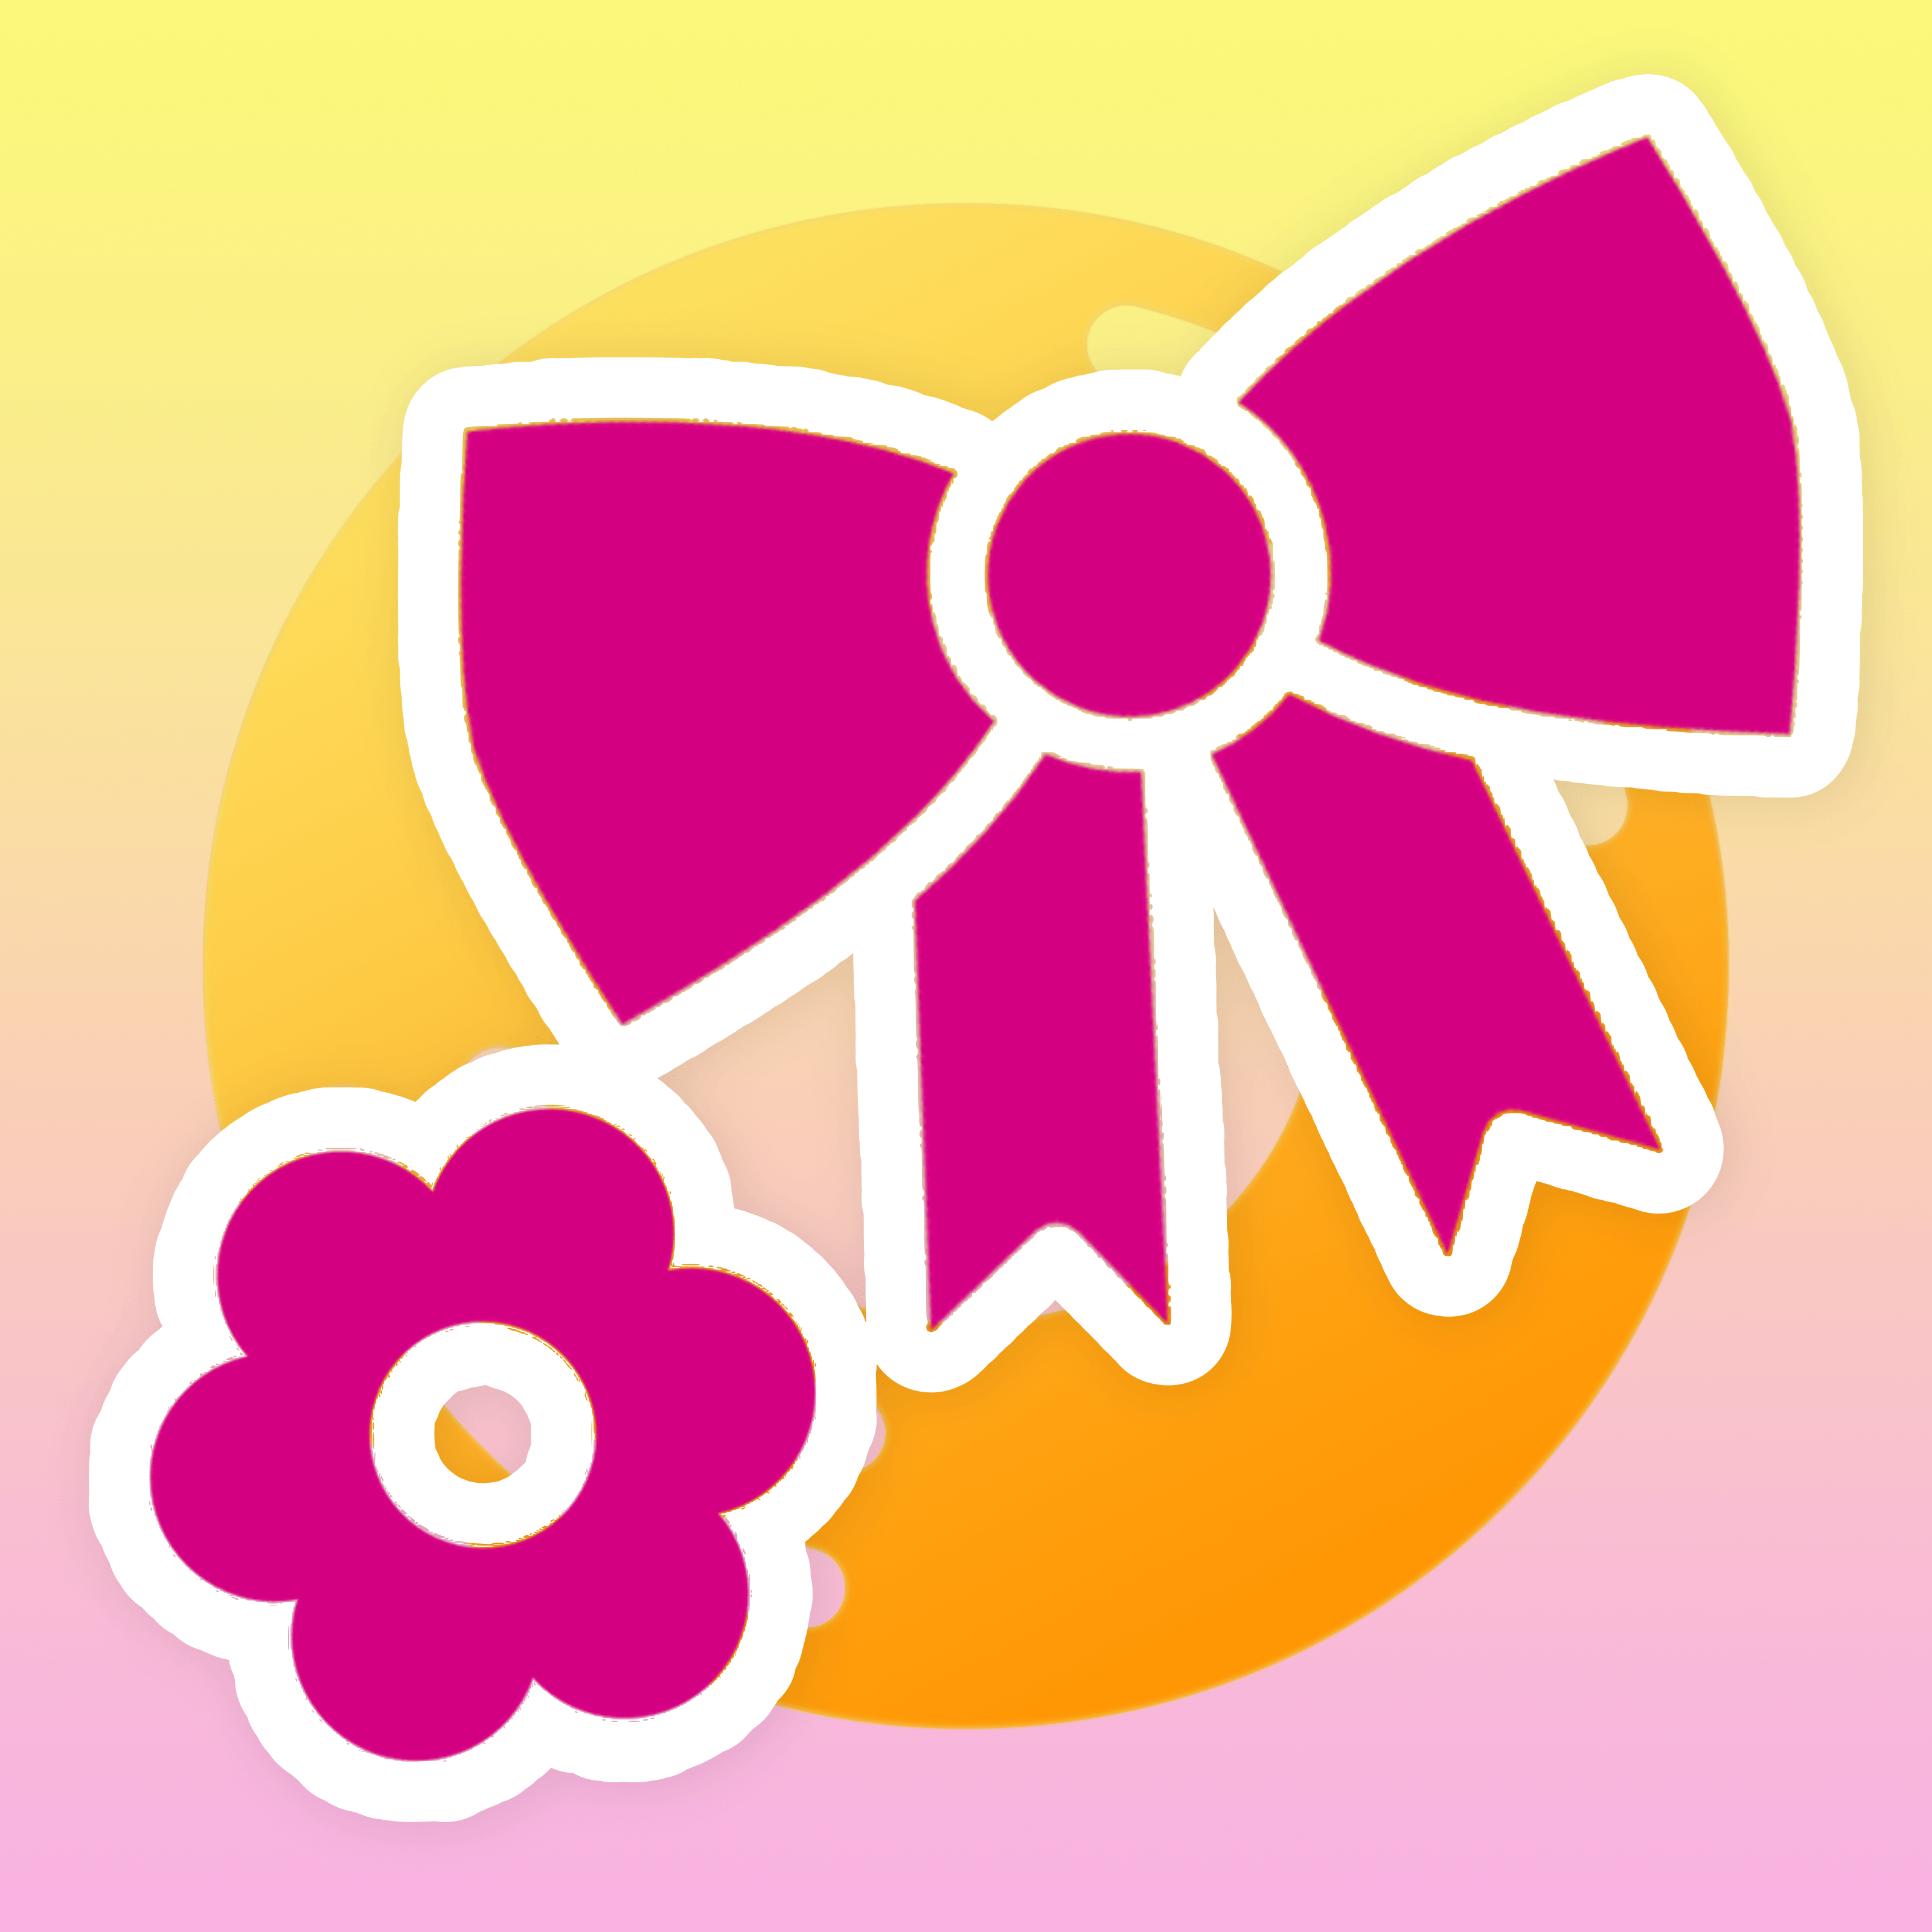 Rocket avatar